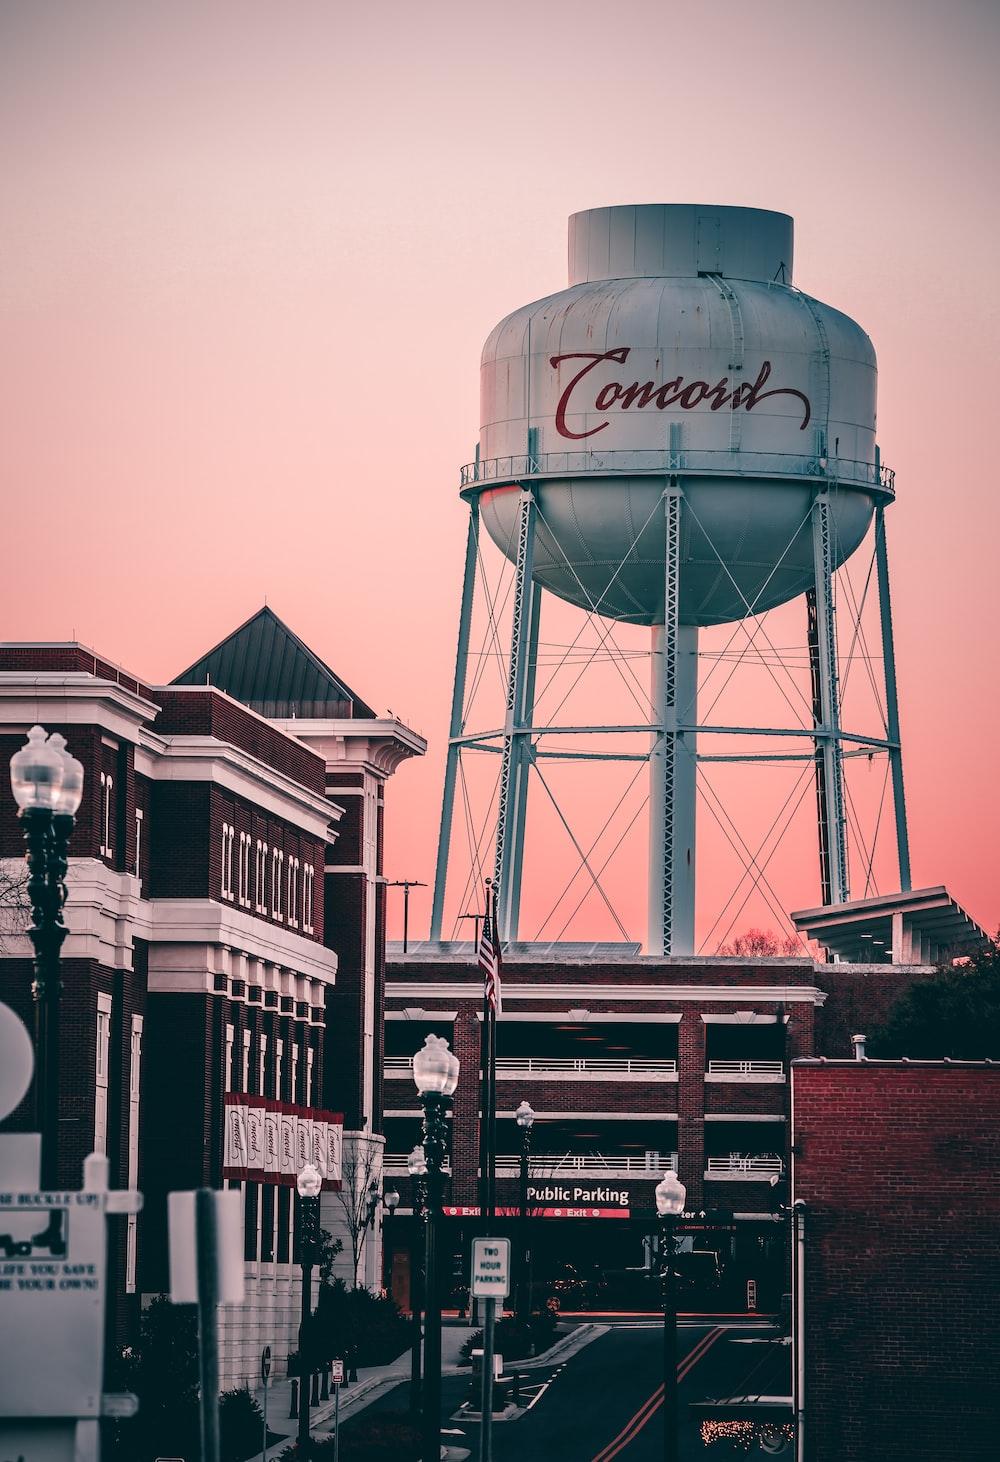 Concord septic tank